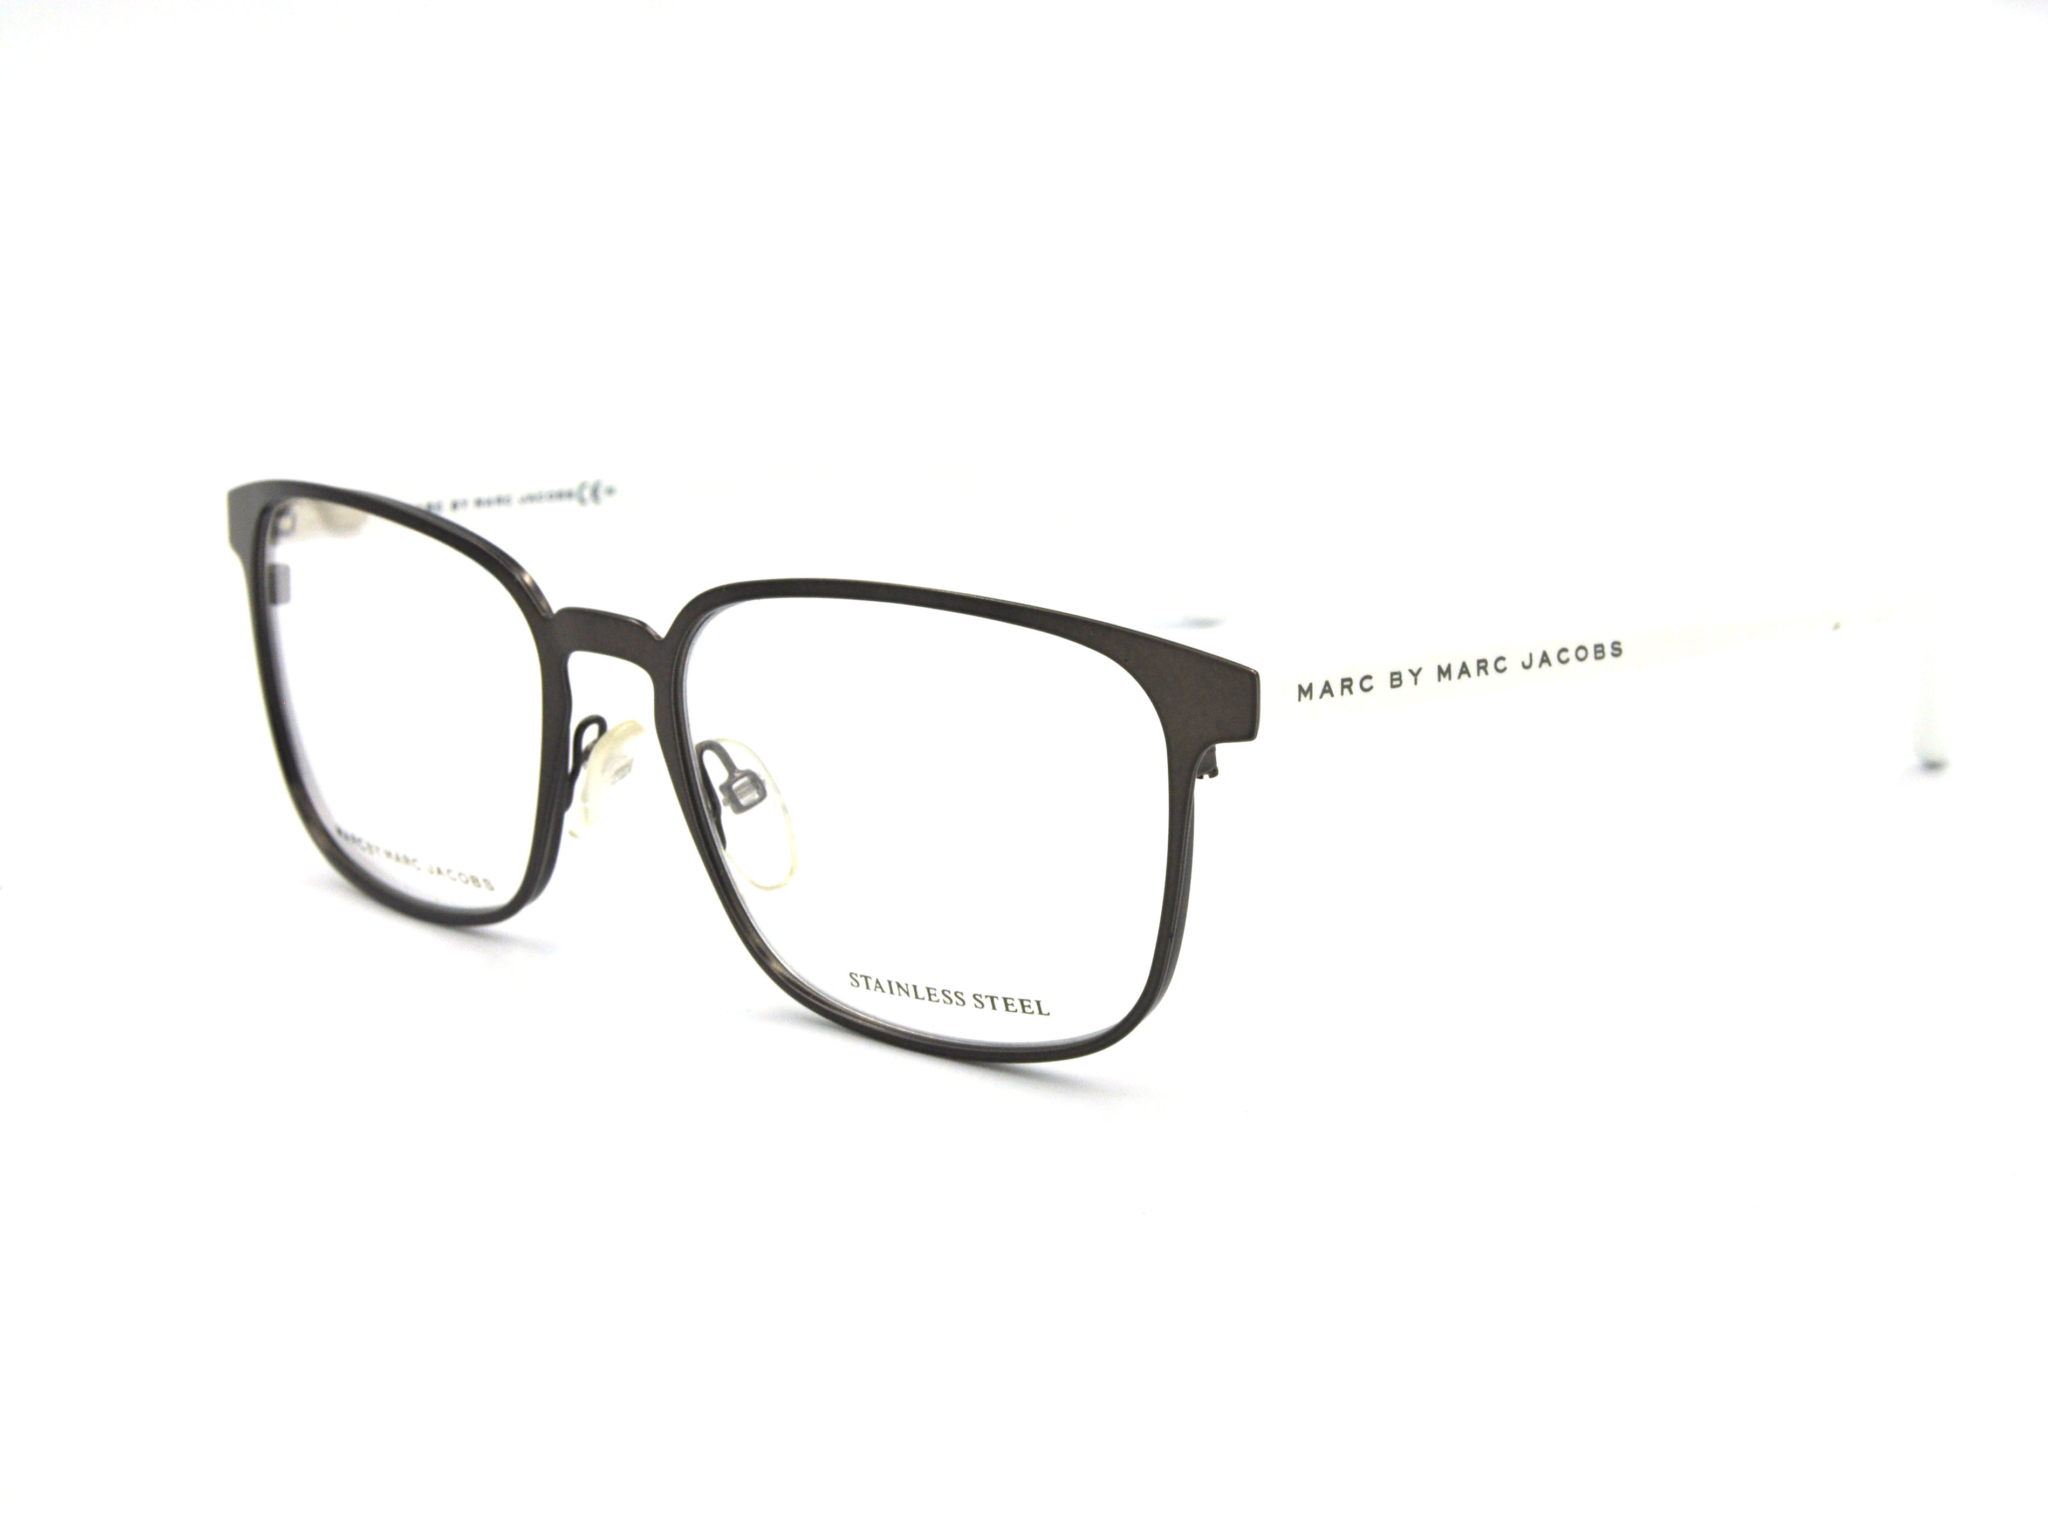 MARC BY MARC JACOBS MMJ515 TFI Prescription Glasses 2020